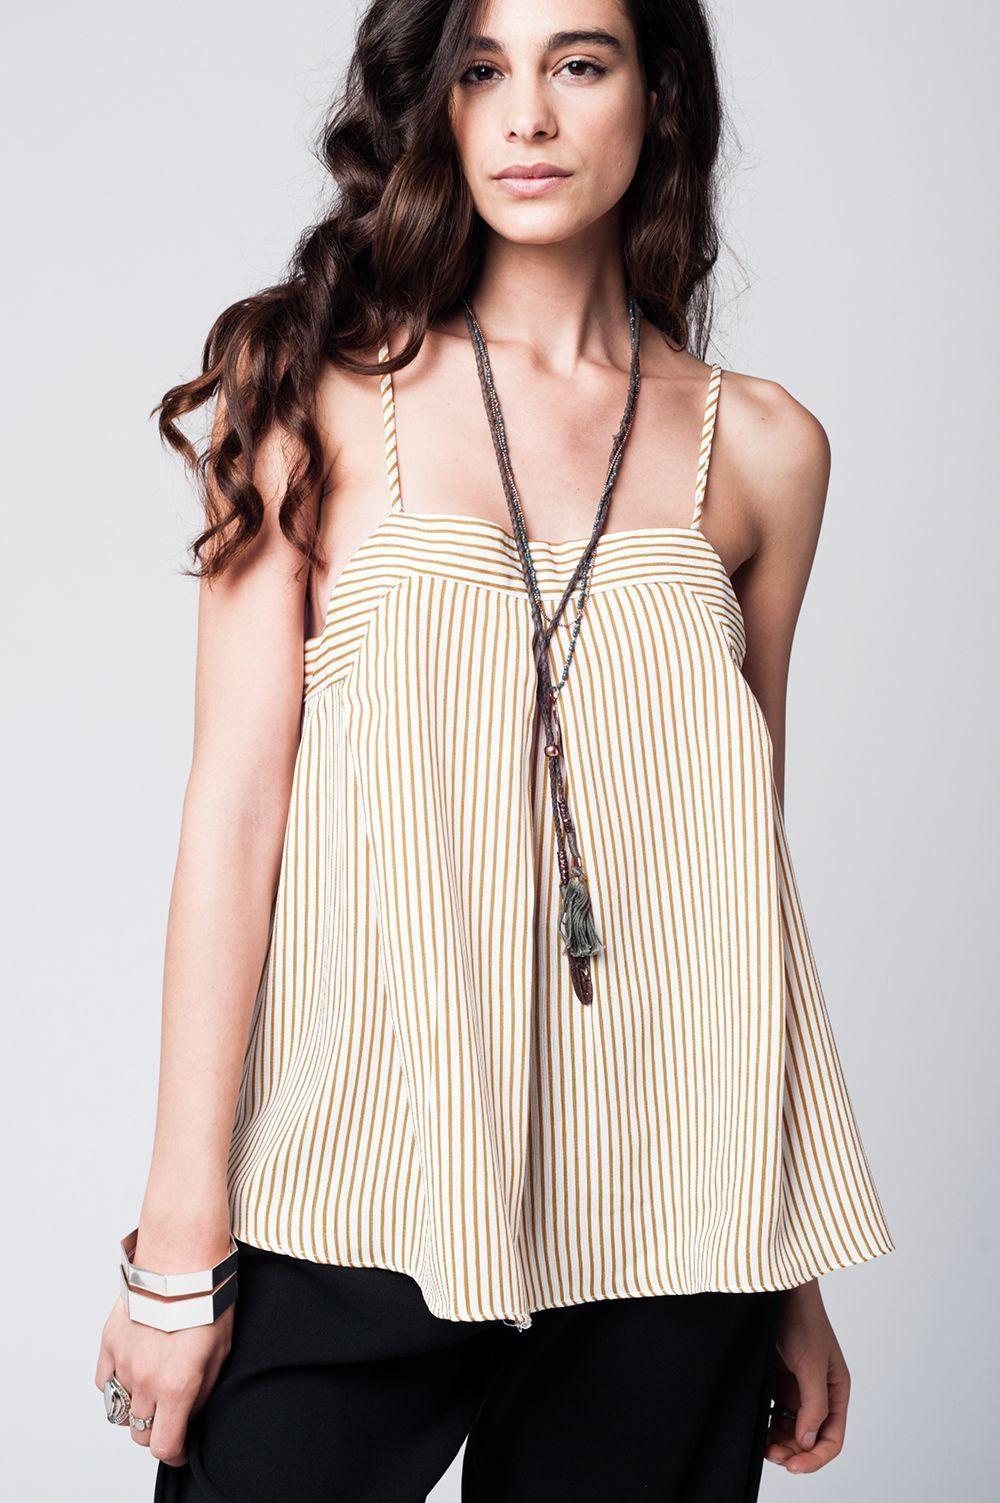 Cami brown and cream stripe top